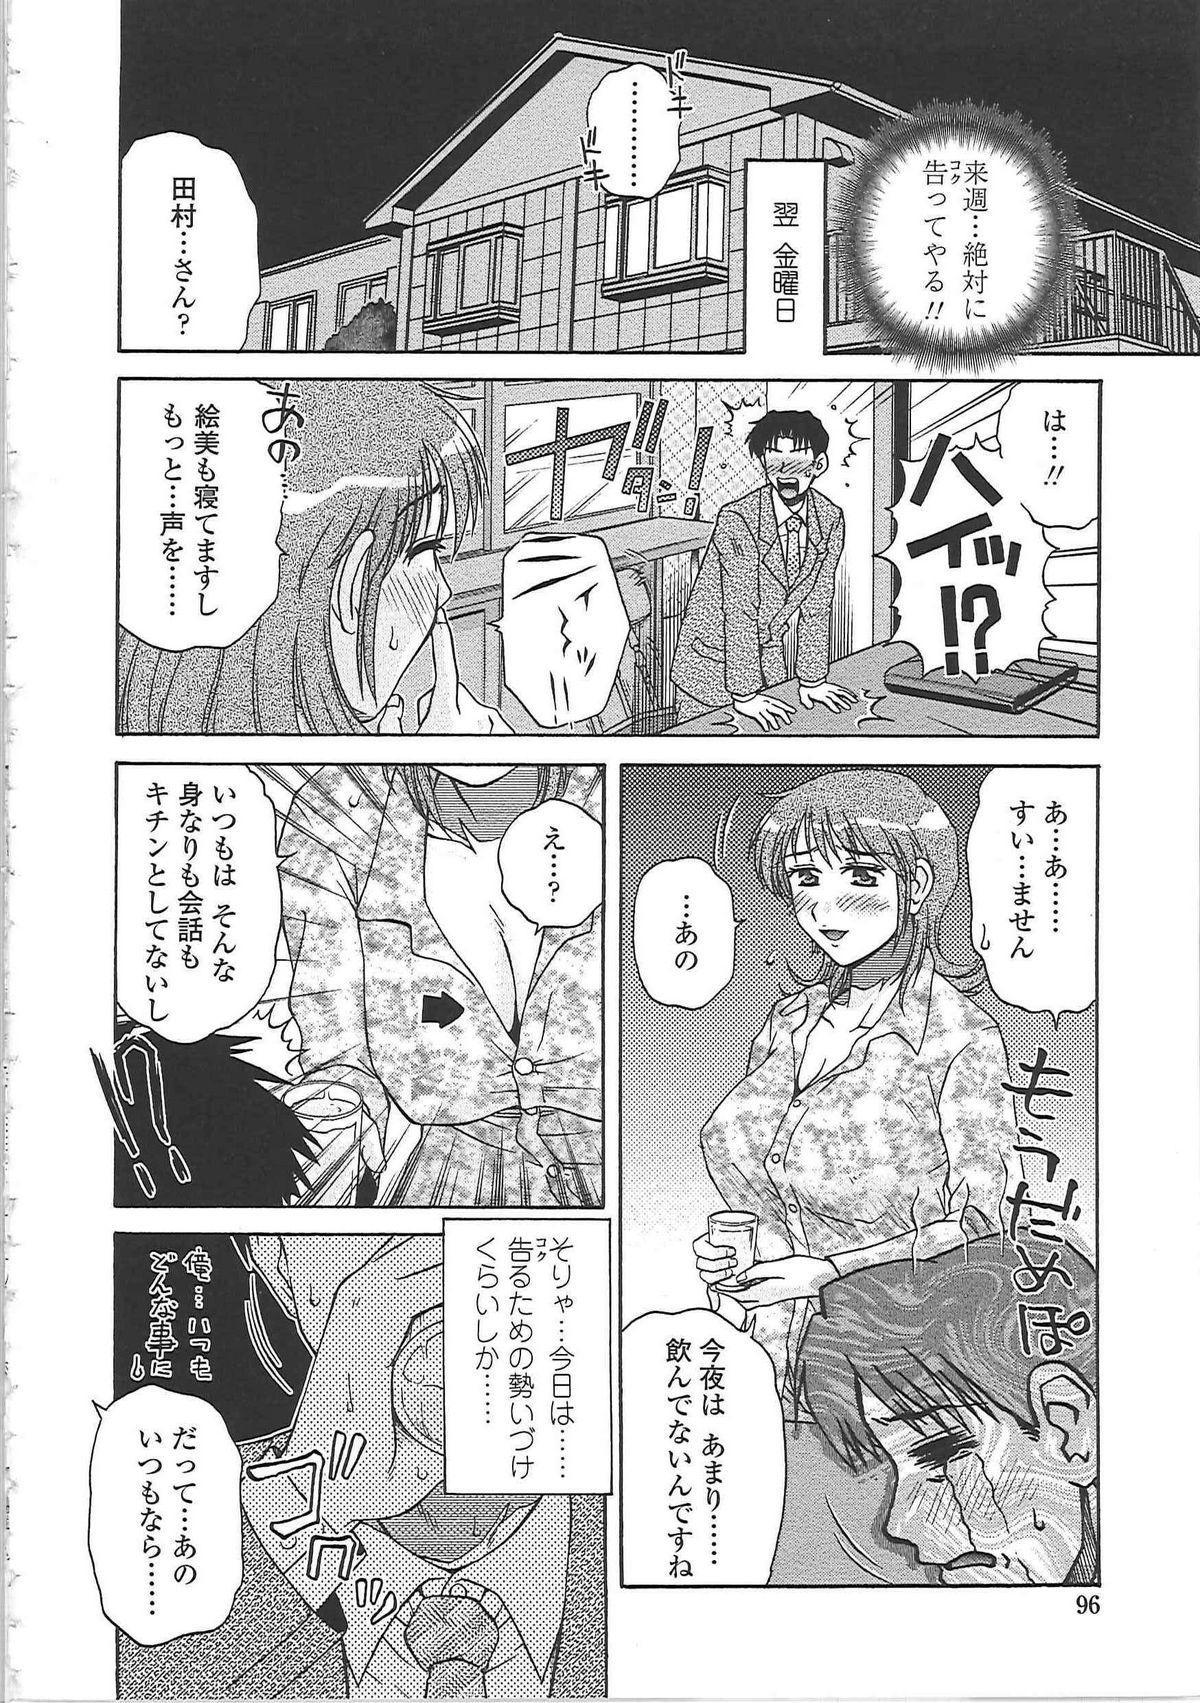 Nikuzuma Tsuushin - Erotic Wife Communication 100